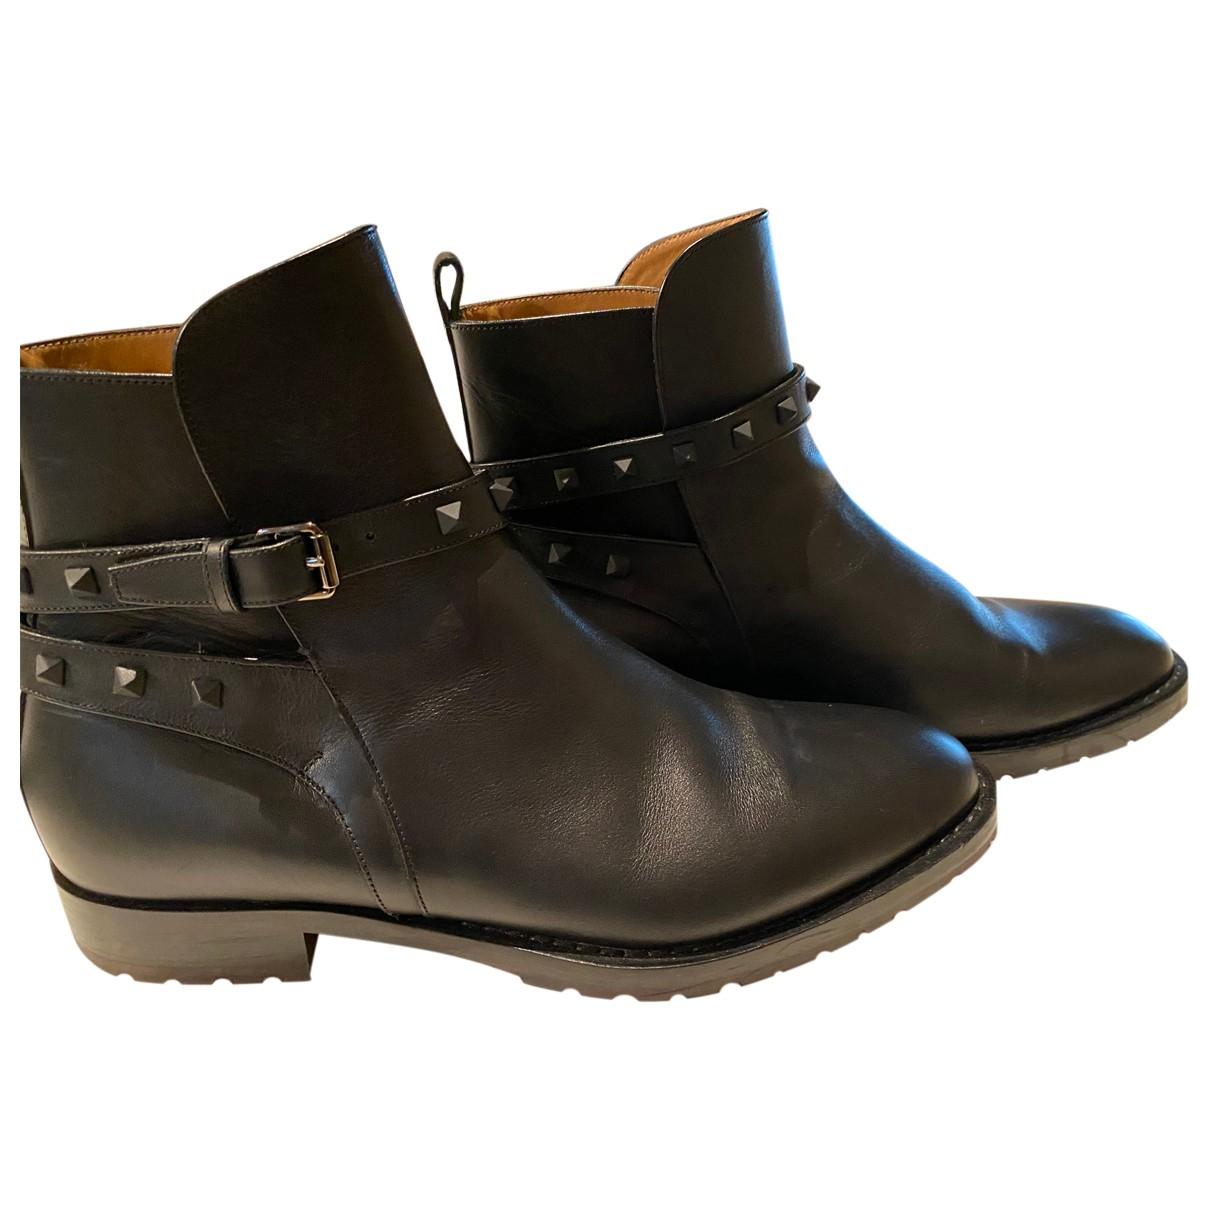 Valentino Garavani N Black Leather Boots for Men 44 EU